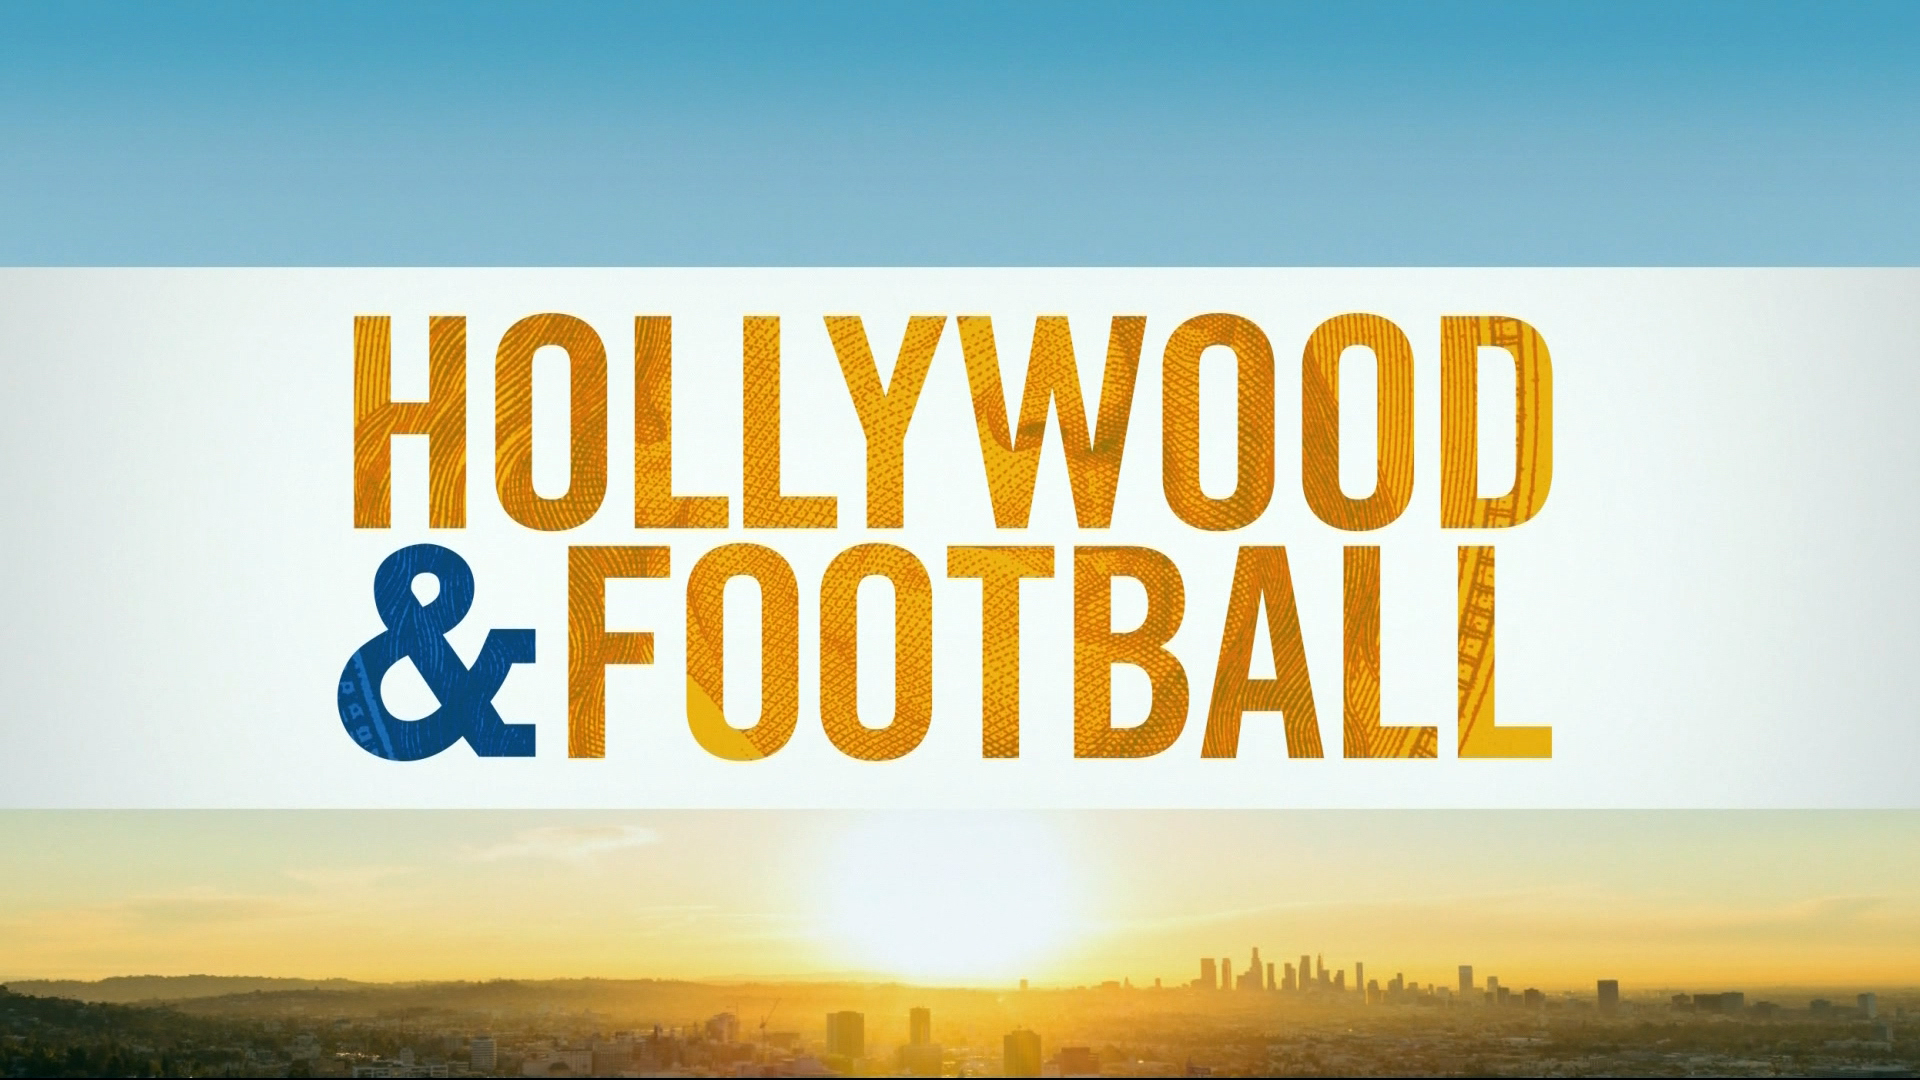 Hollywood & Football